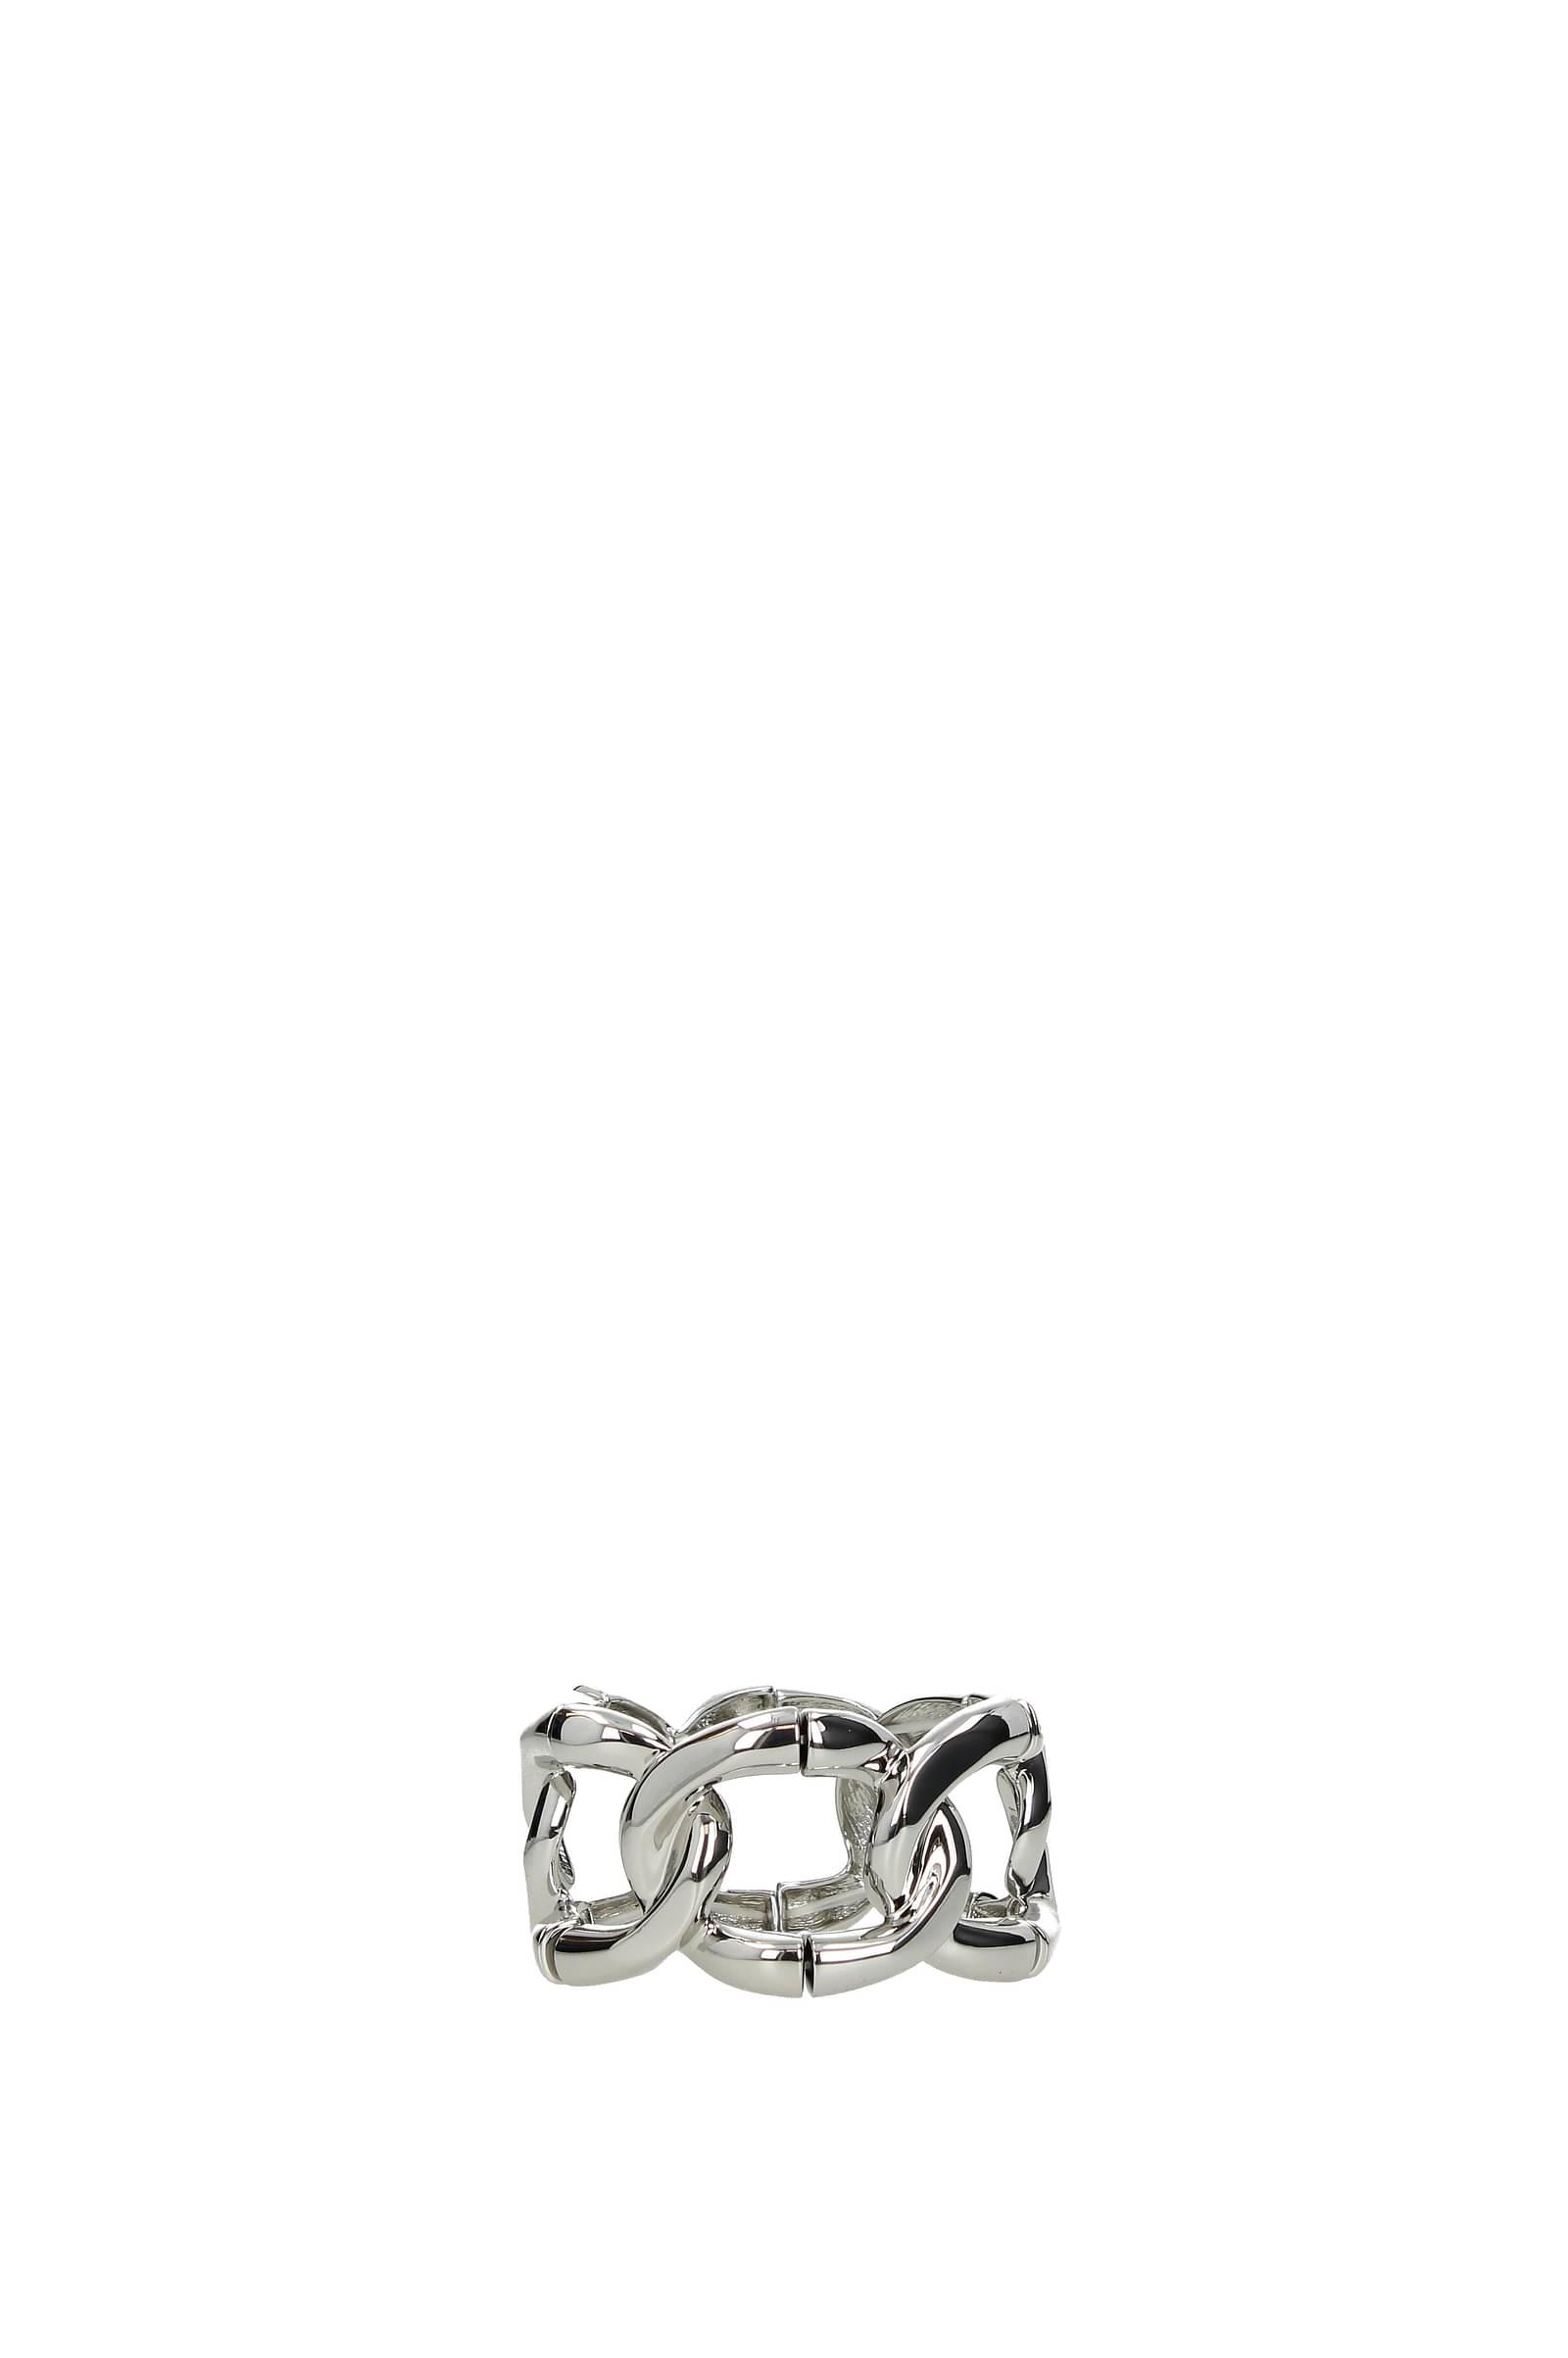 Bracciali-Tory-Burch-Donna-Metallo-45729 miniatura 4